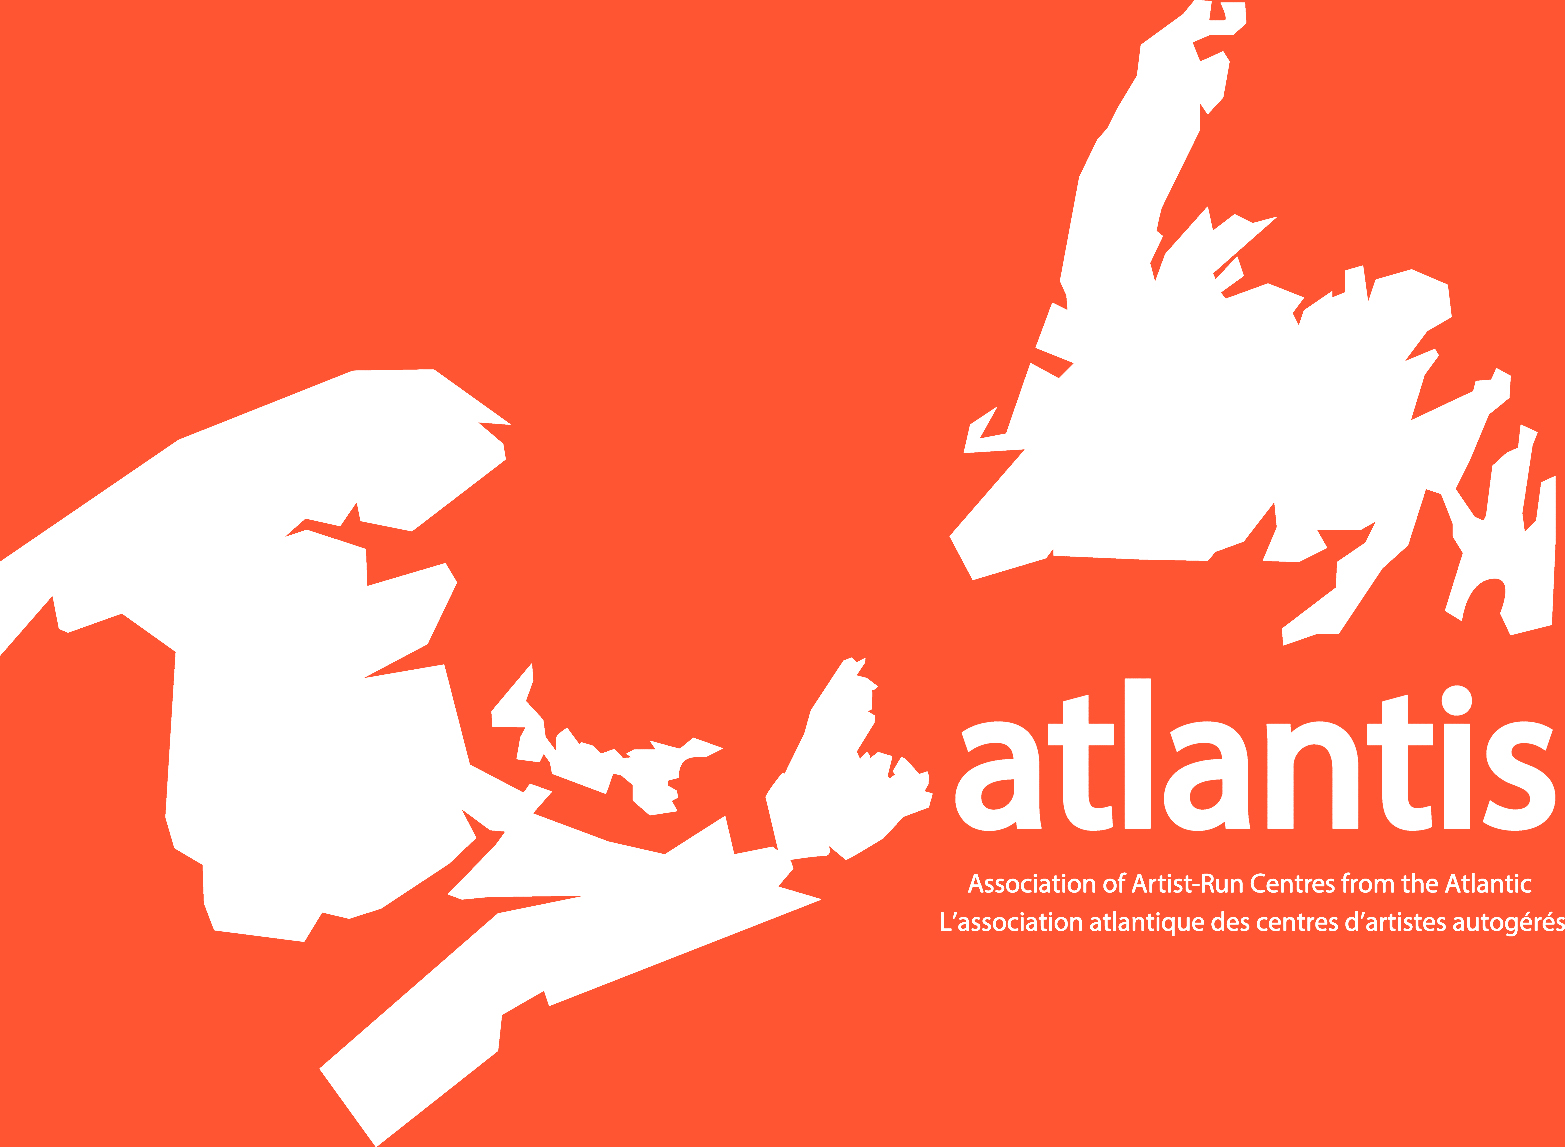 Atlantis_Logo_Red.jpg